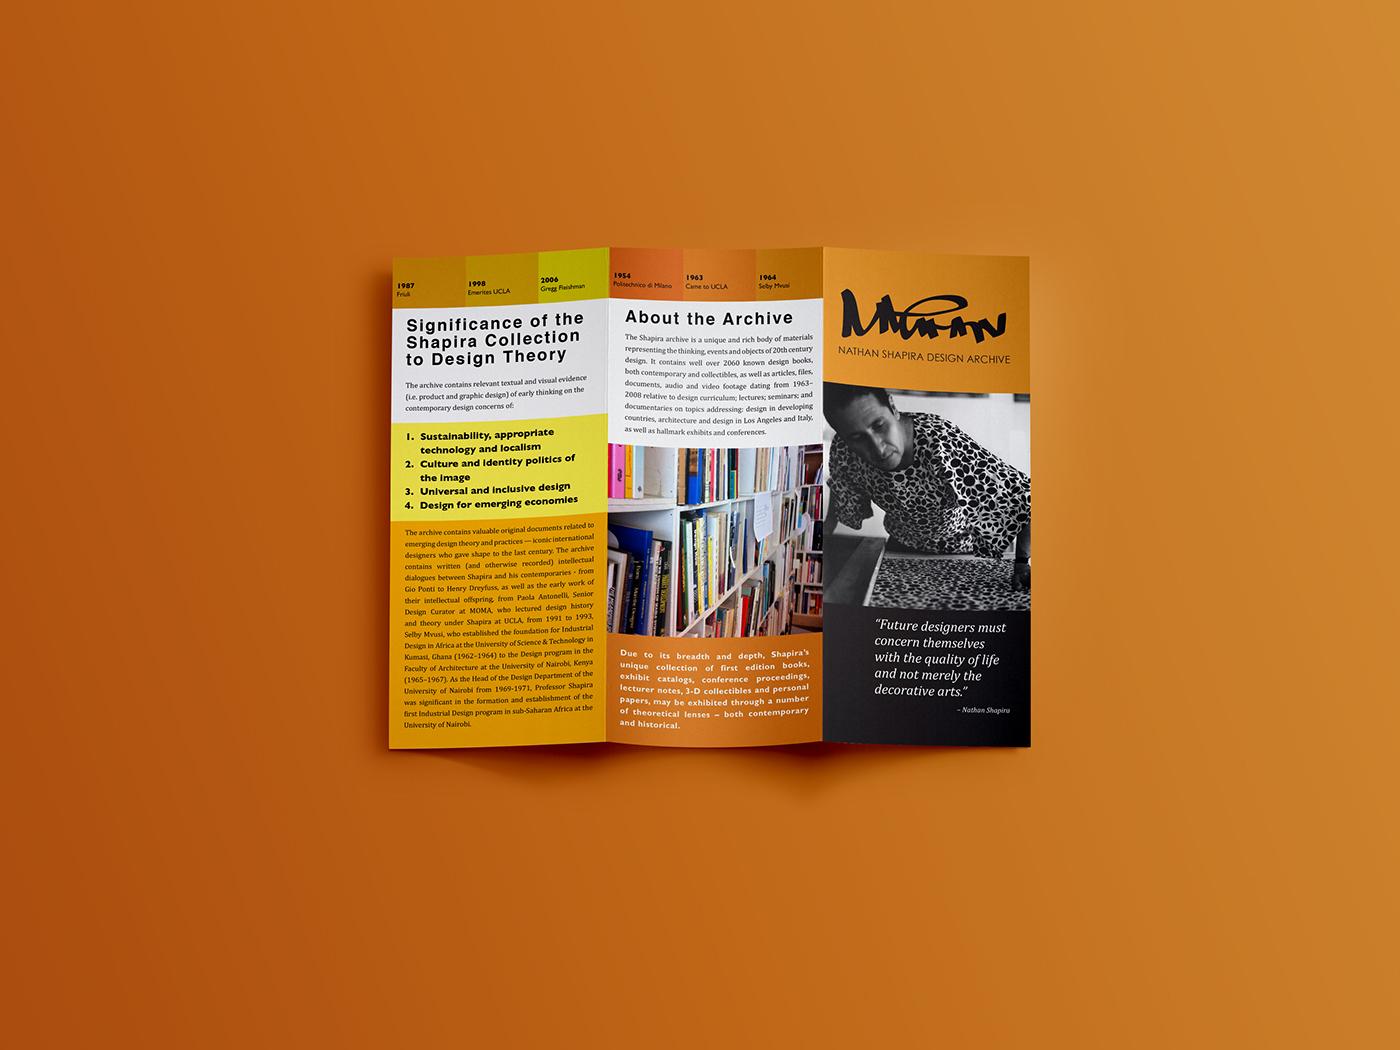 Nathan Shapira Design Archive